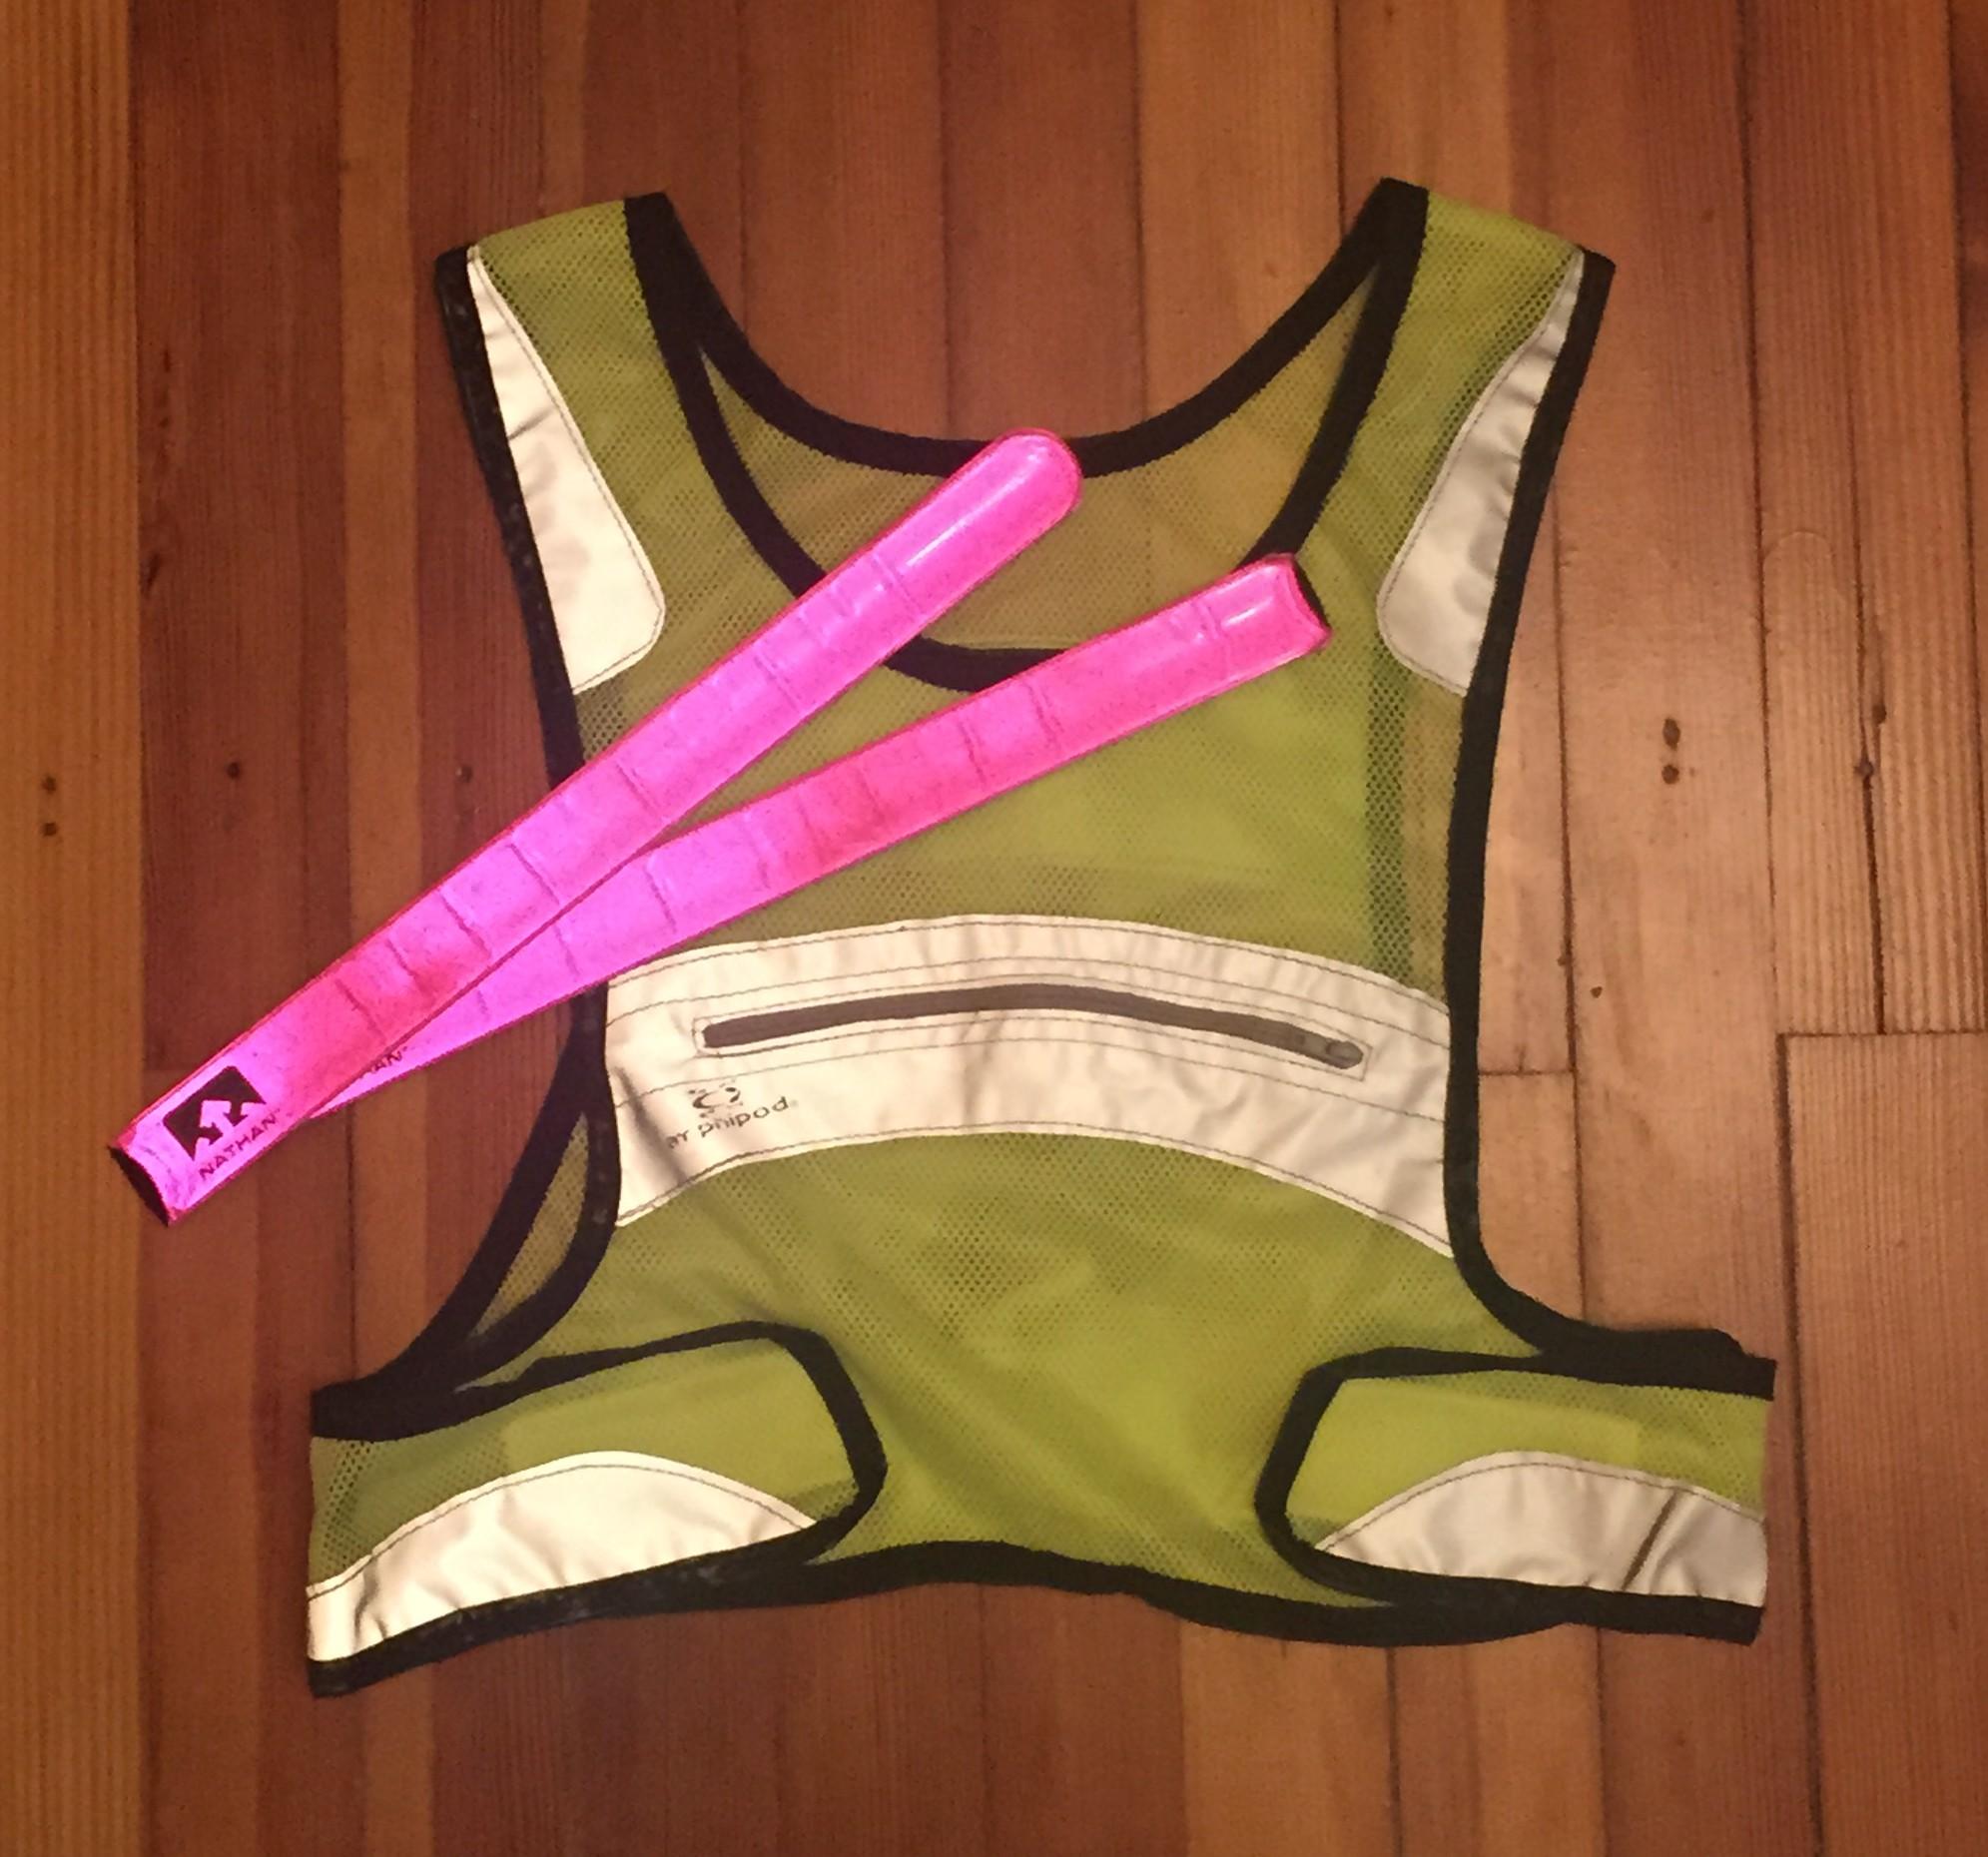 reflective gear for beginner runners 1 reflective vest reflective leg bands night running safety